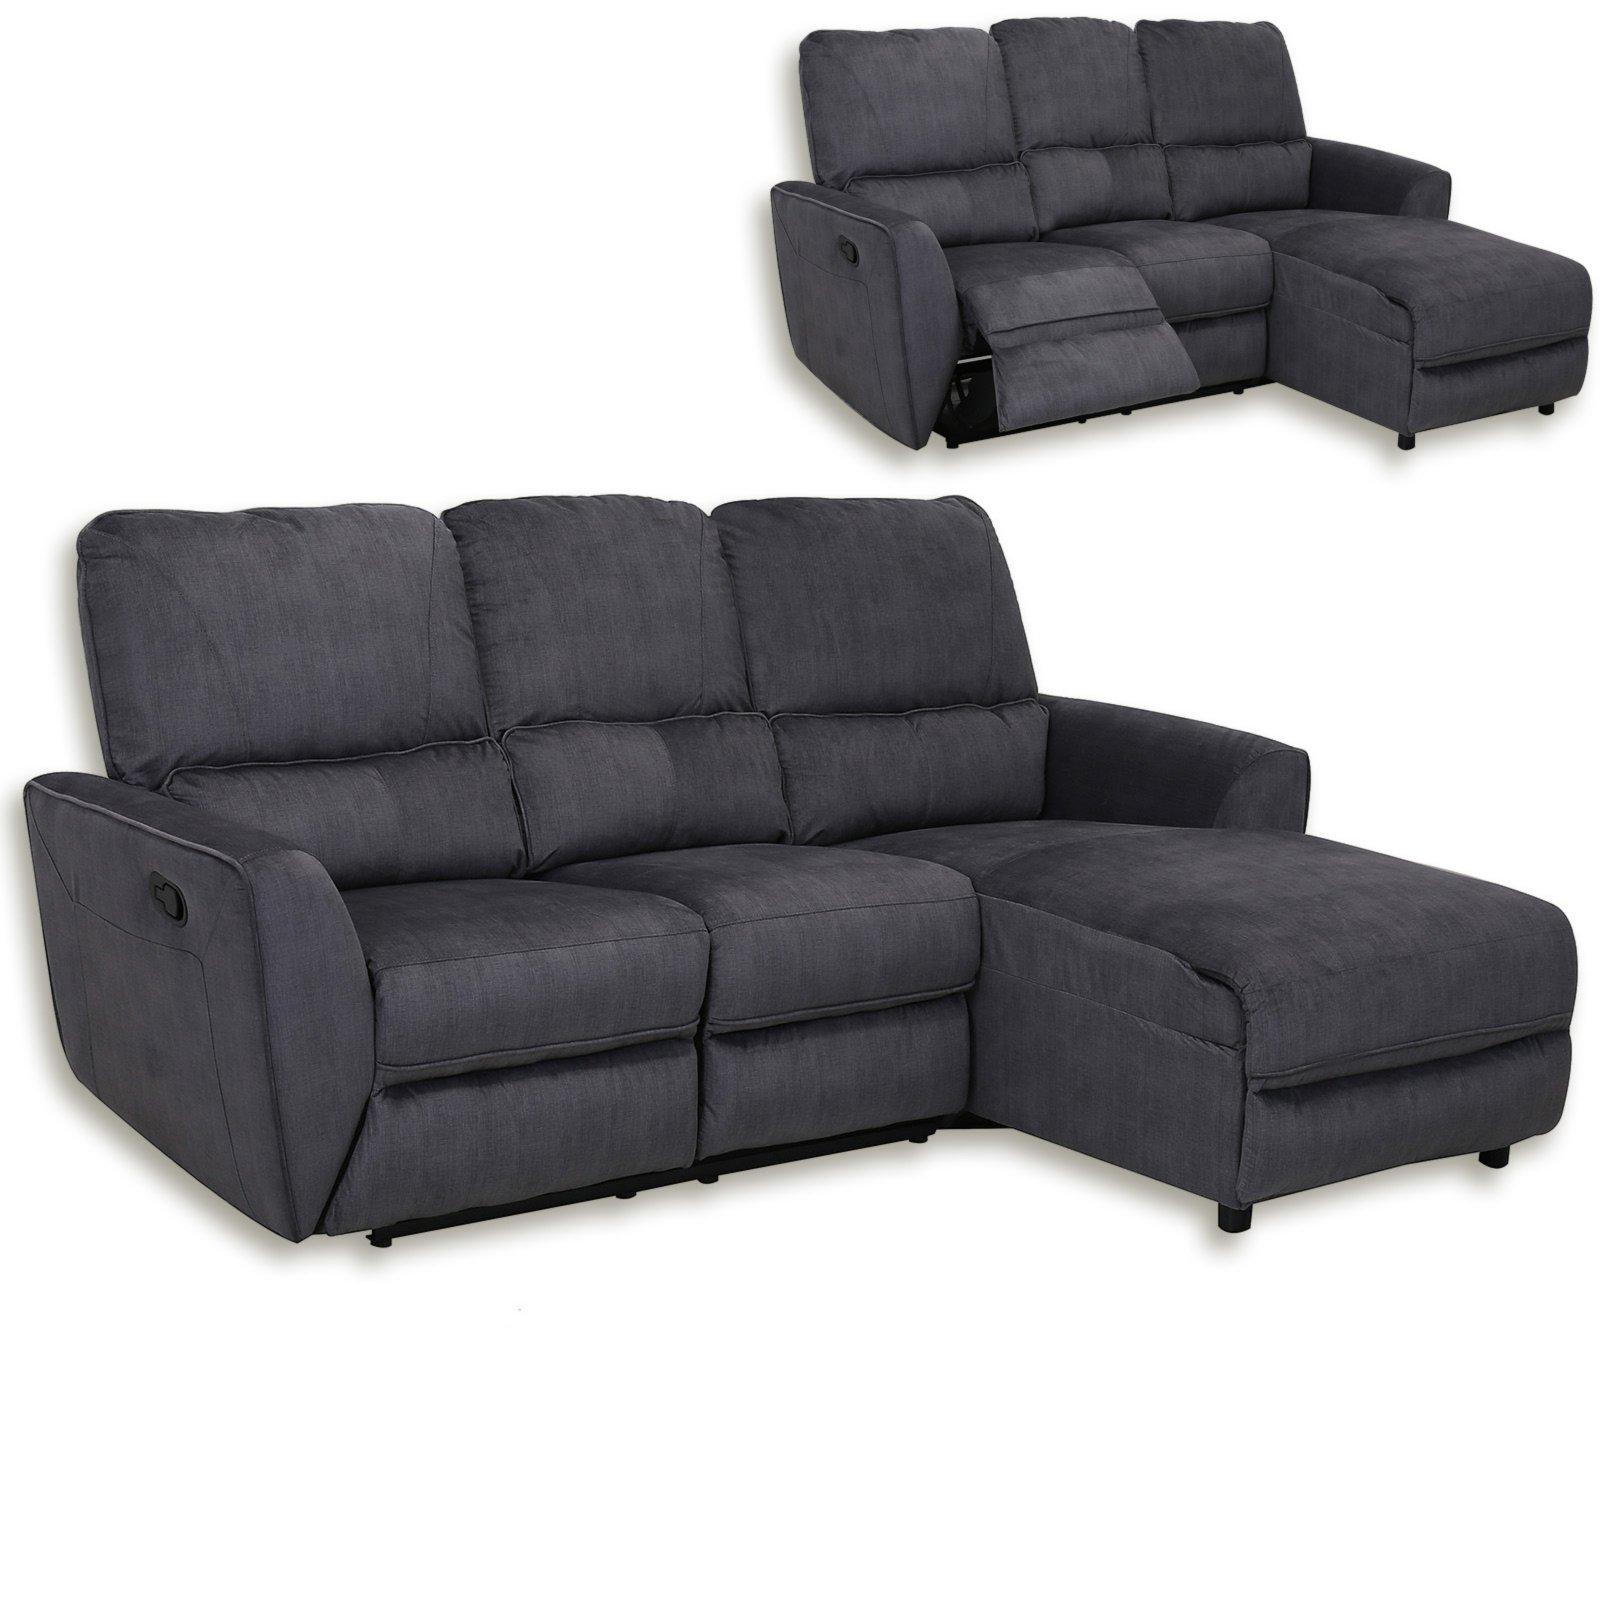 ecksofa grau microfaser relaxfunktion ecksofas l form sofas couches m bel roller. Black Bedroom Furniture Sets. Home Design Ideas